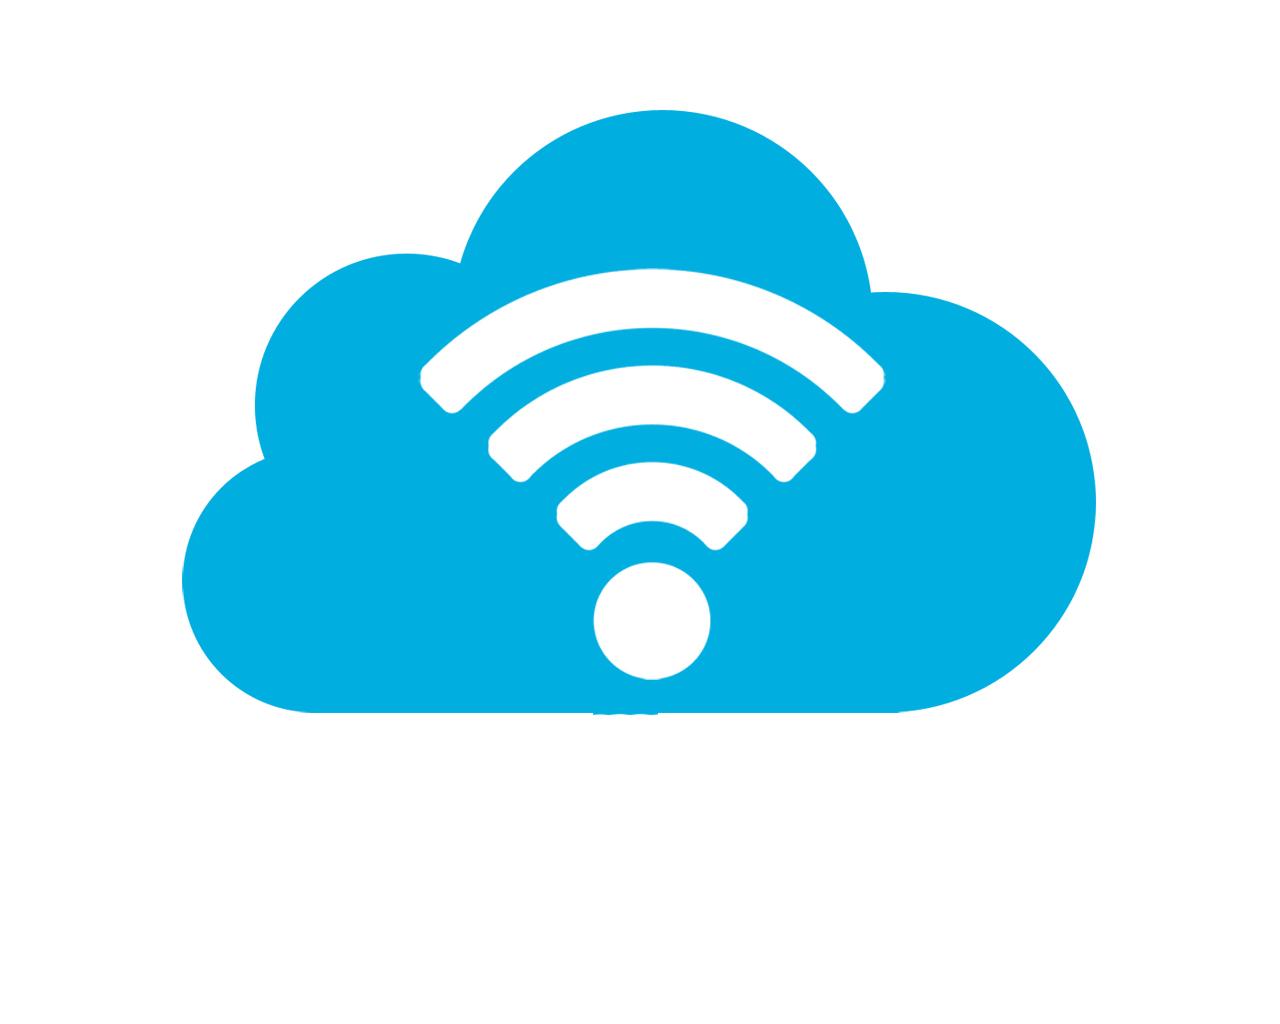 PNG Internet Cloud - 52560